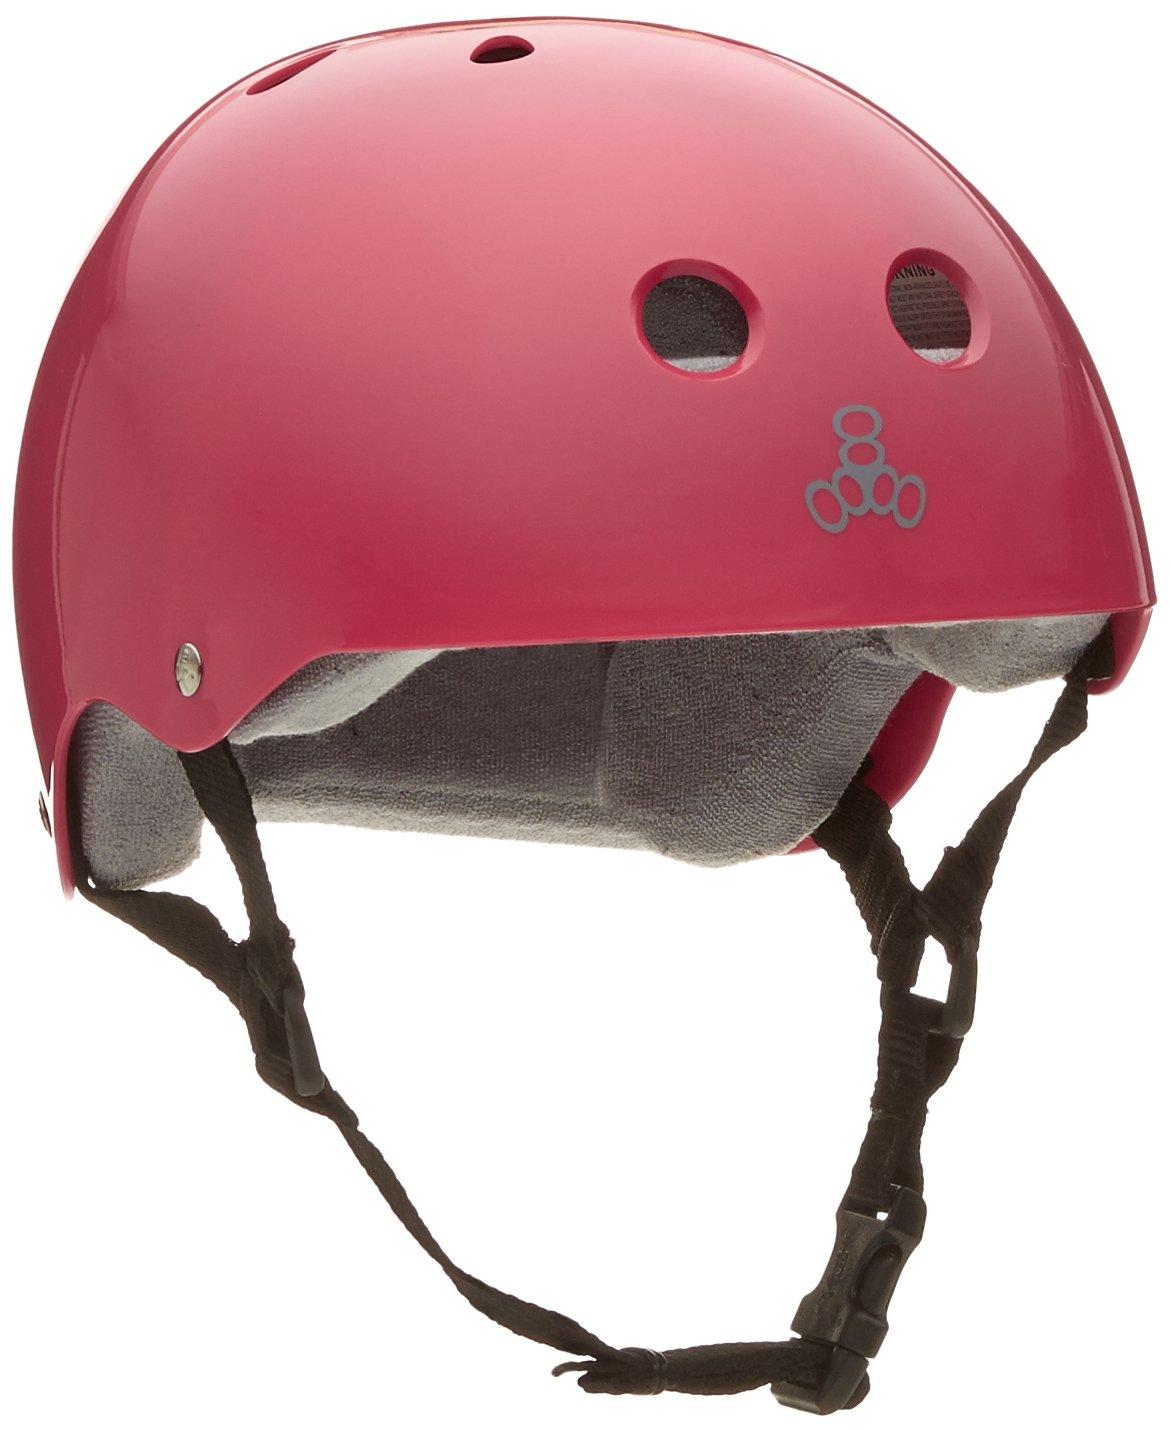 Triple Eight Helmet with Sweatsaver Liner, Pink Glossy, Medium